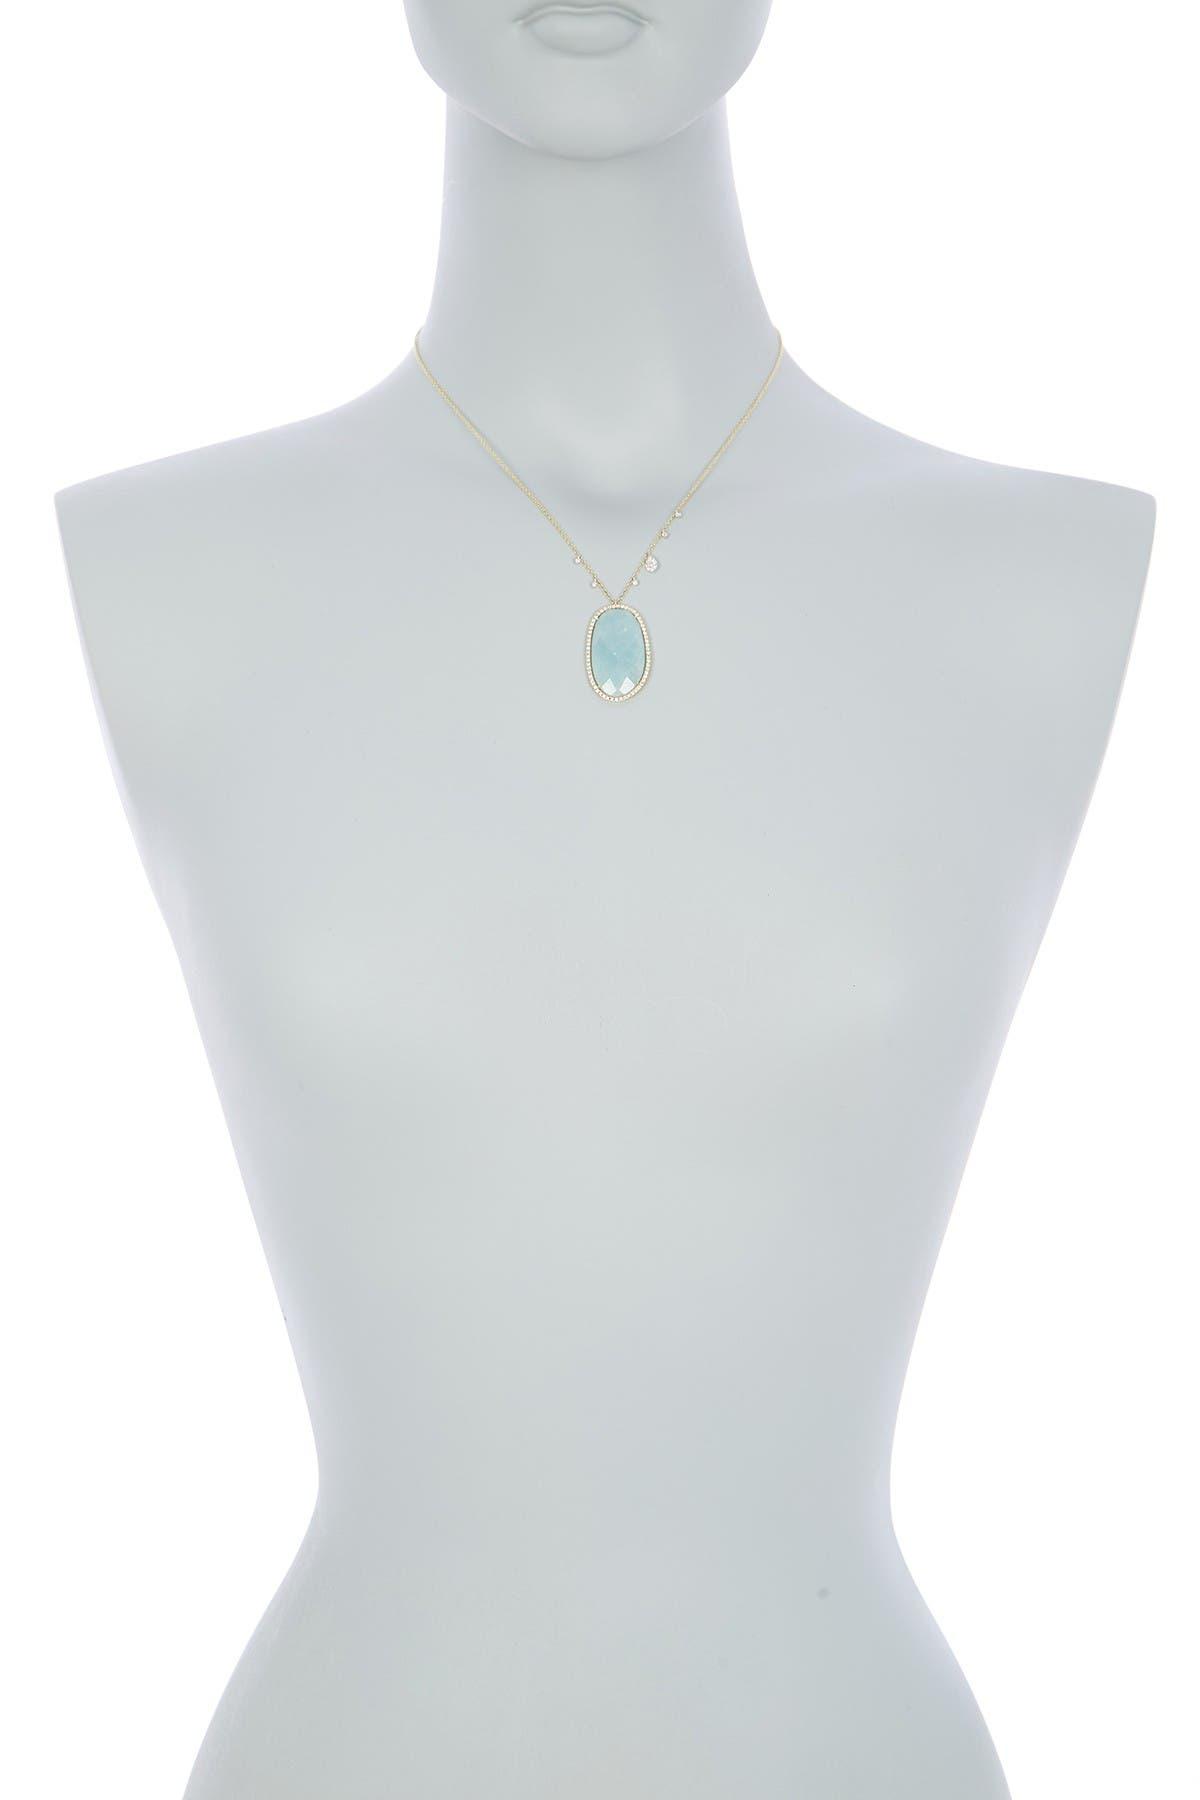 Meira T 14k Yellow Gold Diamond Accent Aquamarine Pendant Necklace